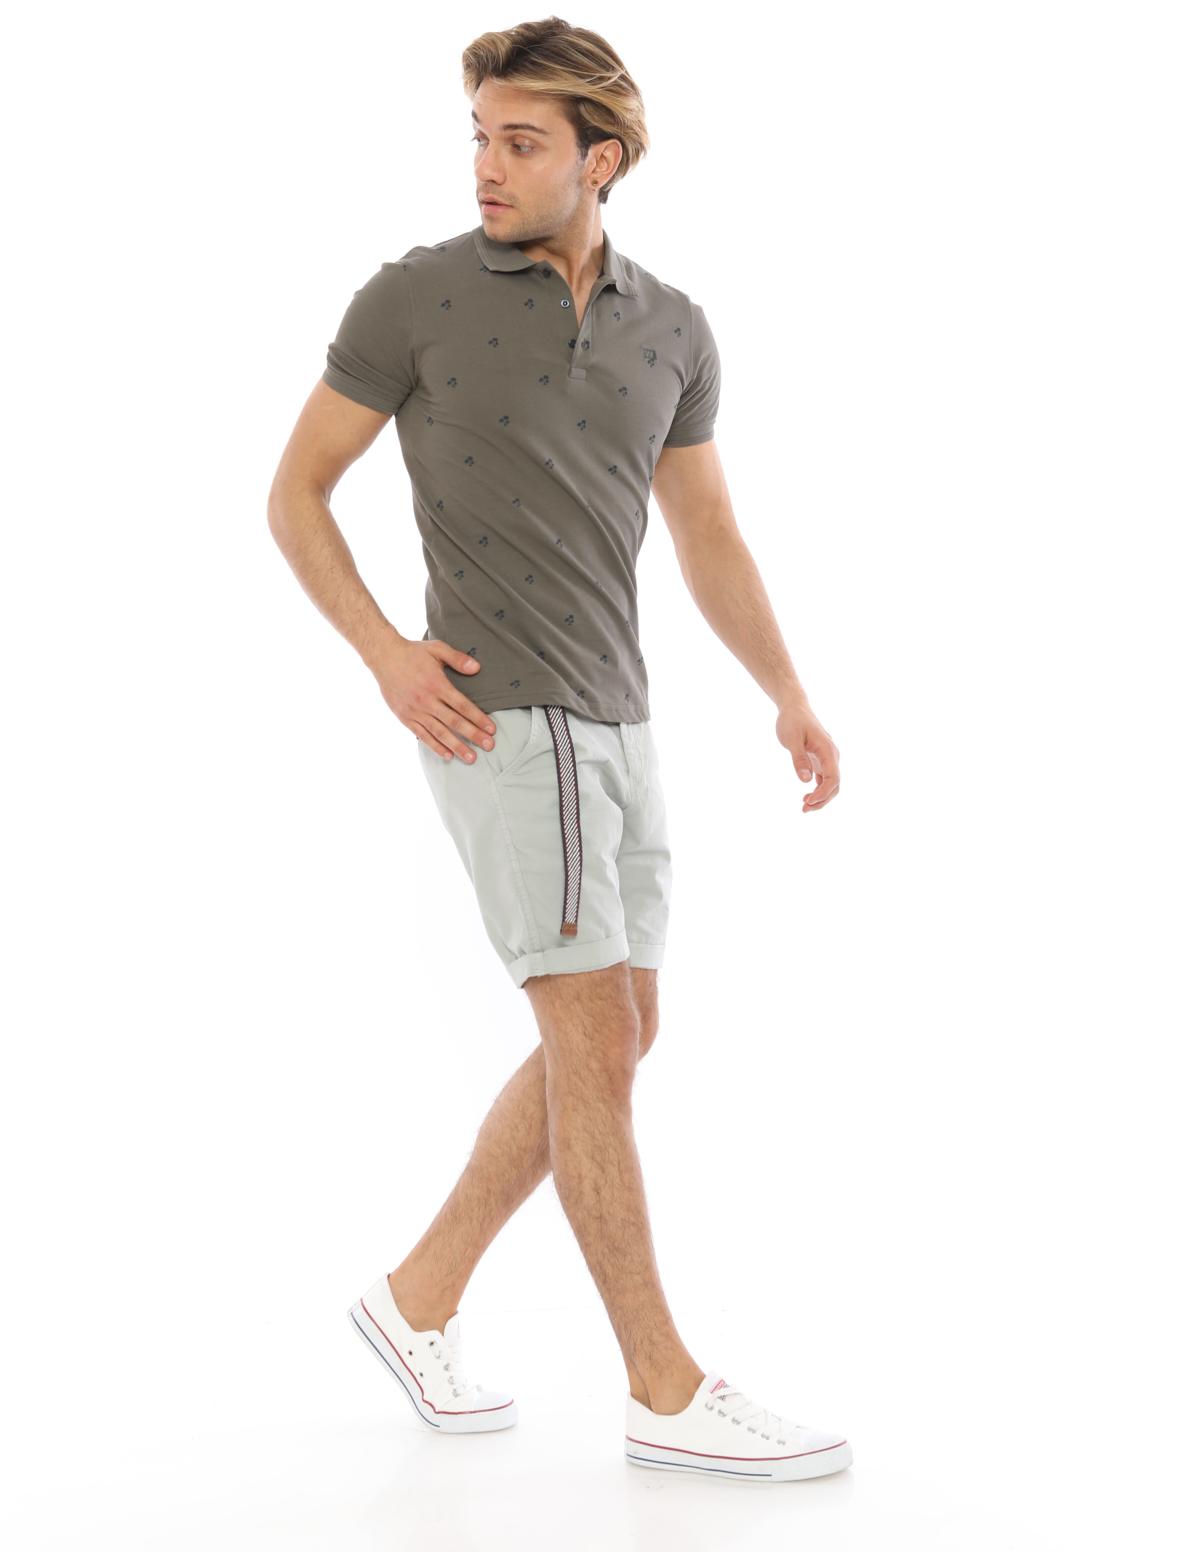 t-shirt 9625 Kısa Short 9310